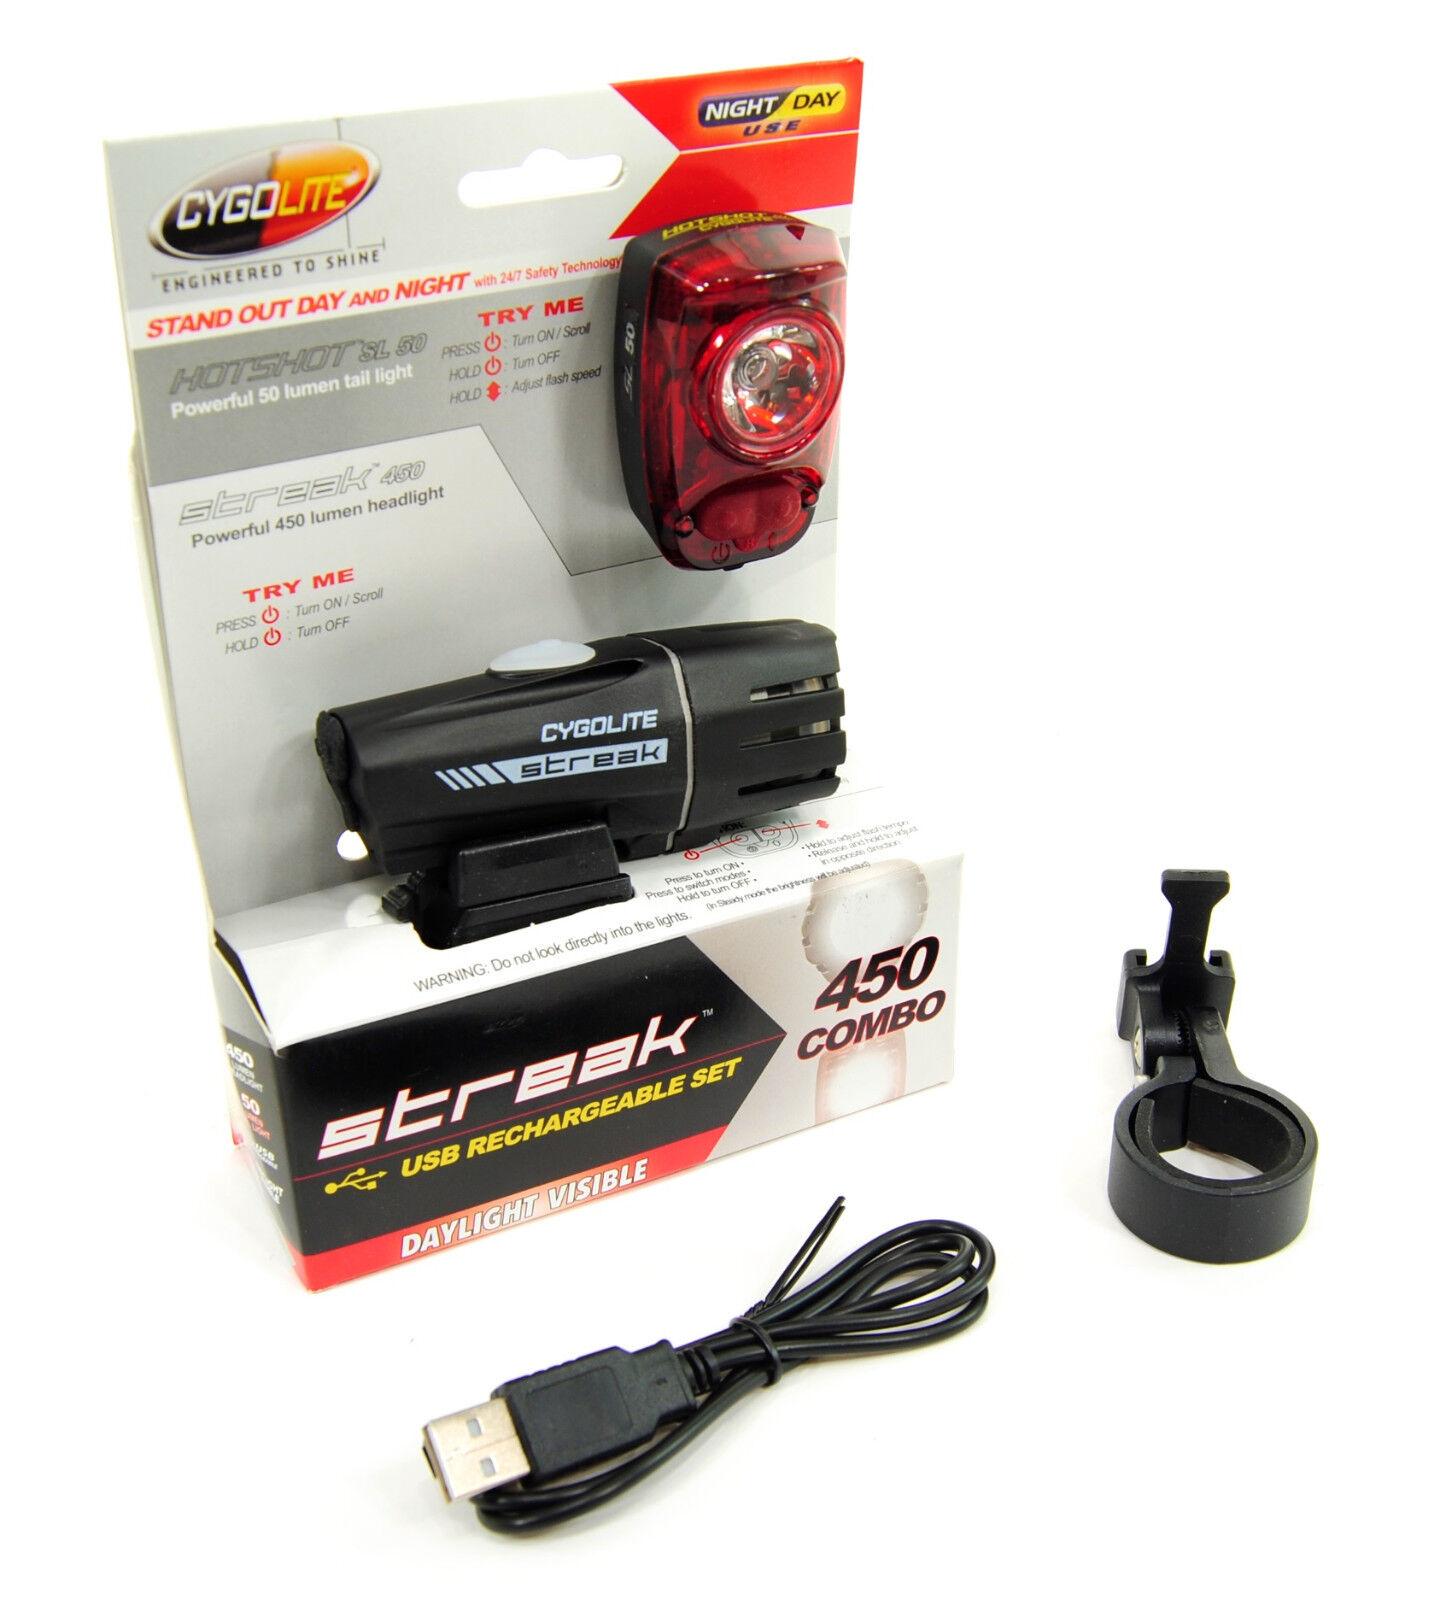 Cygolite Streak 450 Bicycle Headlight and Hotshot SL  50 Taillight Set  good price